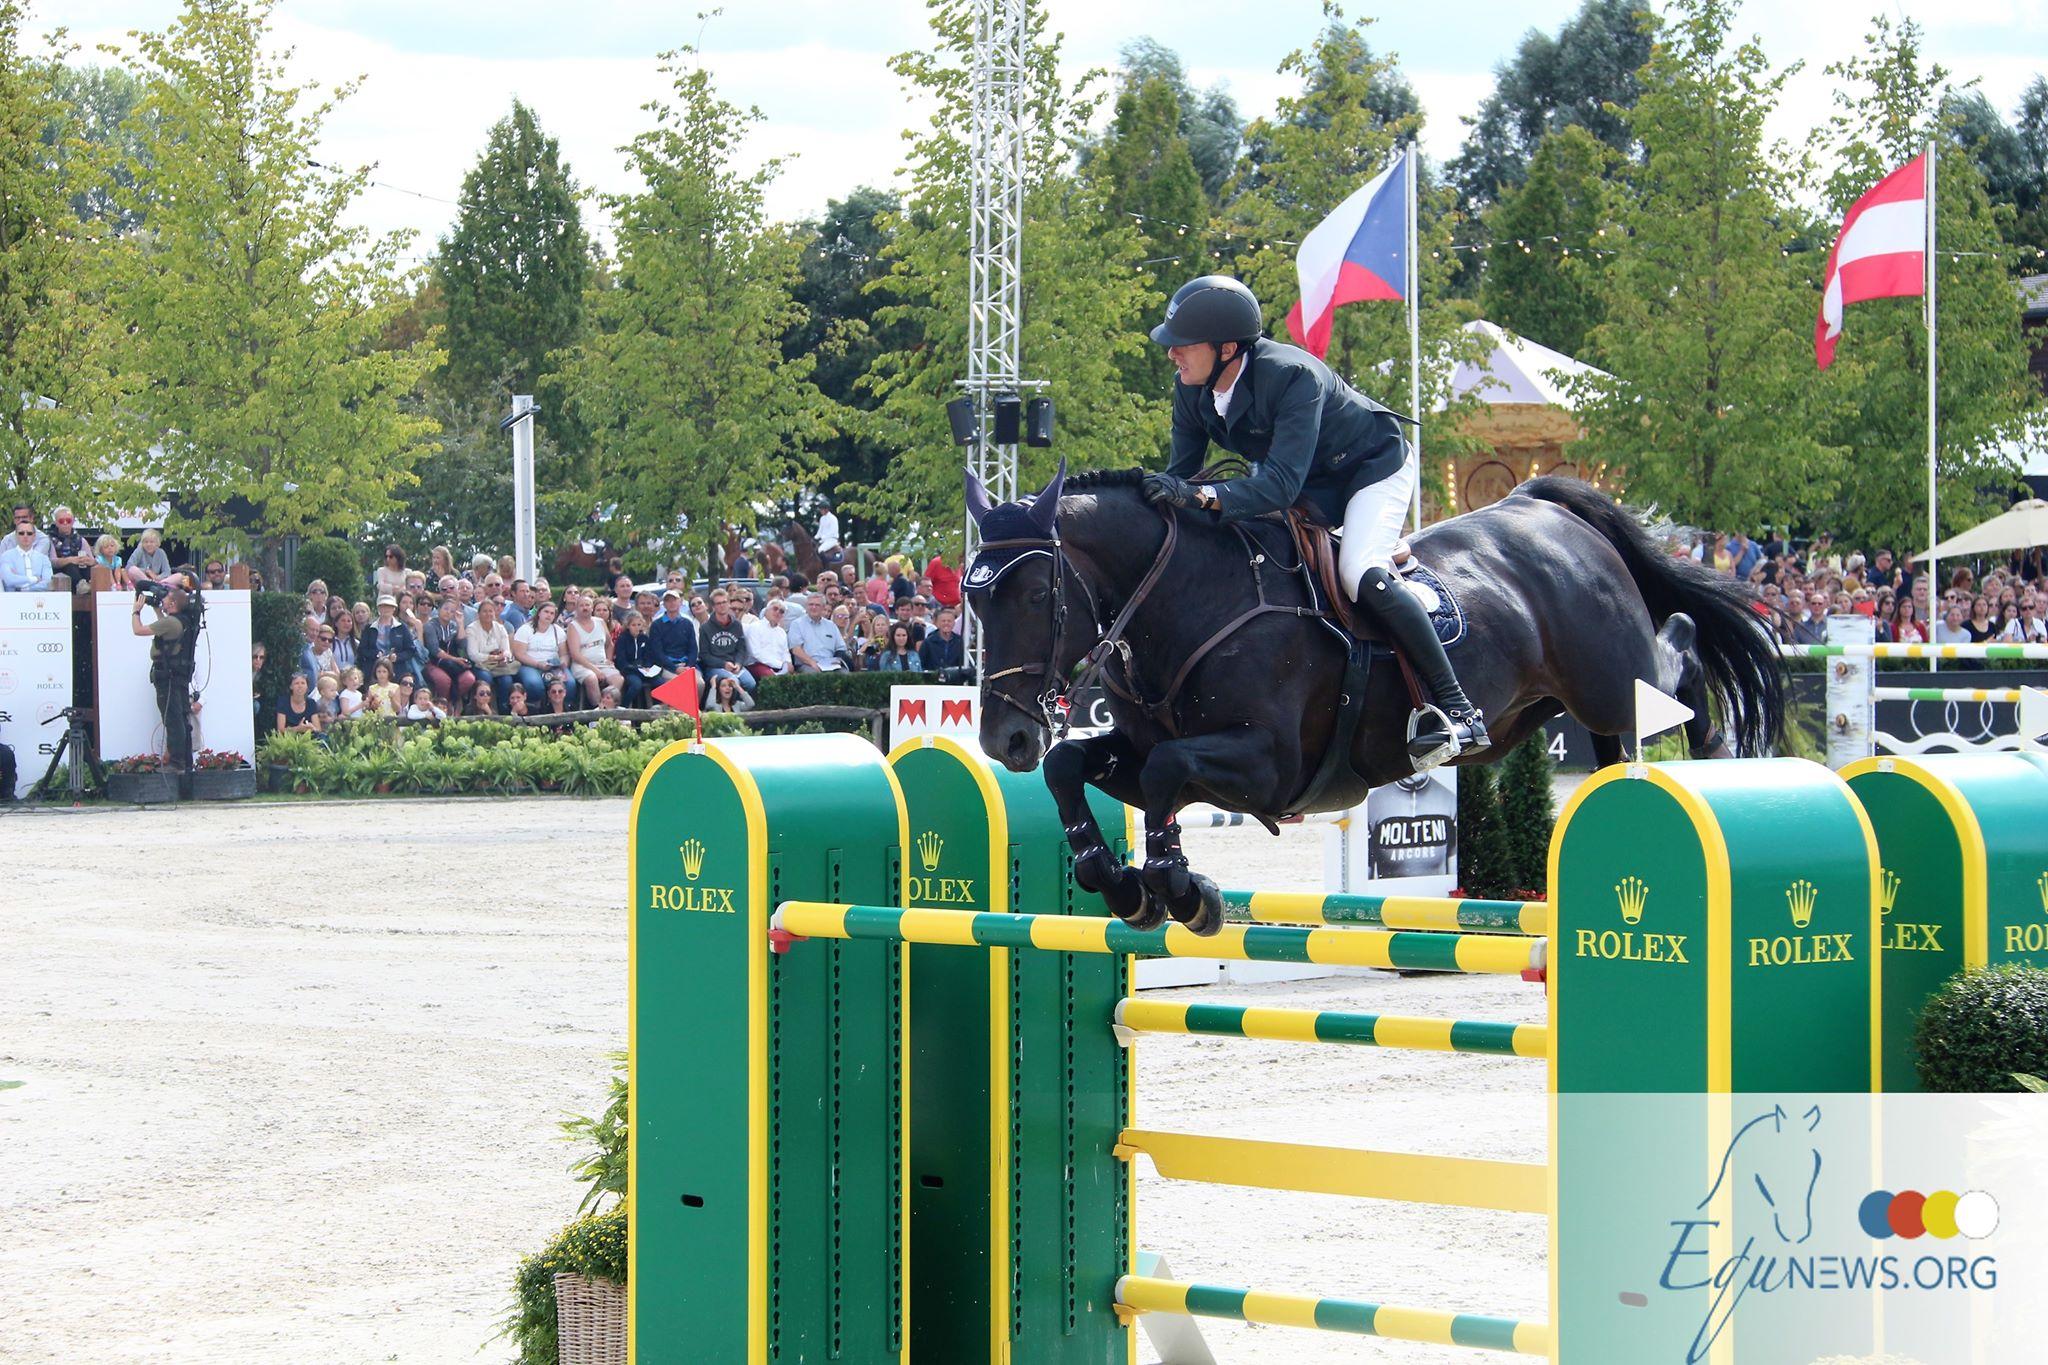 Gregory Wathelet en tête du podium belge dans la rubrique classement Opglabbeek